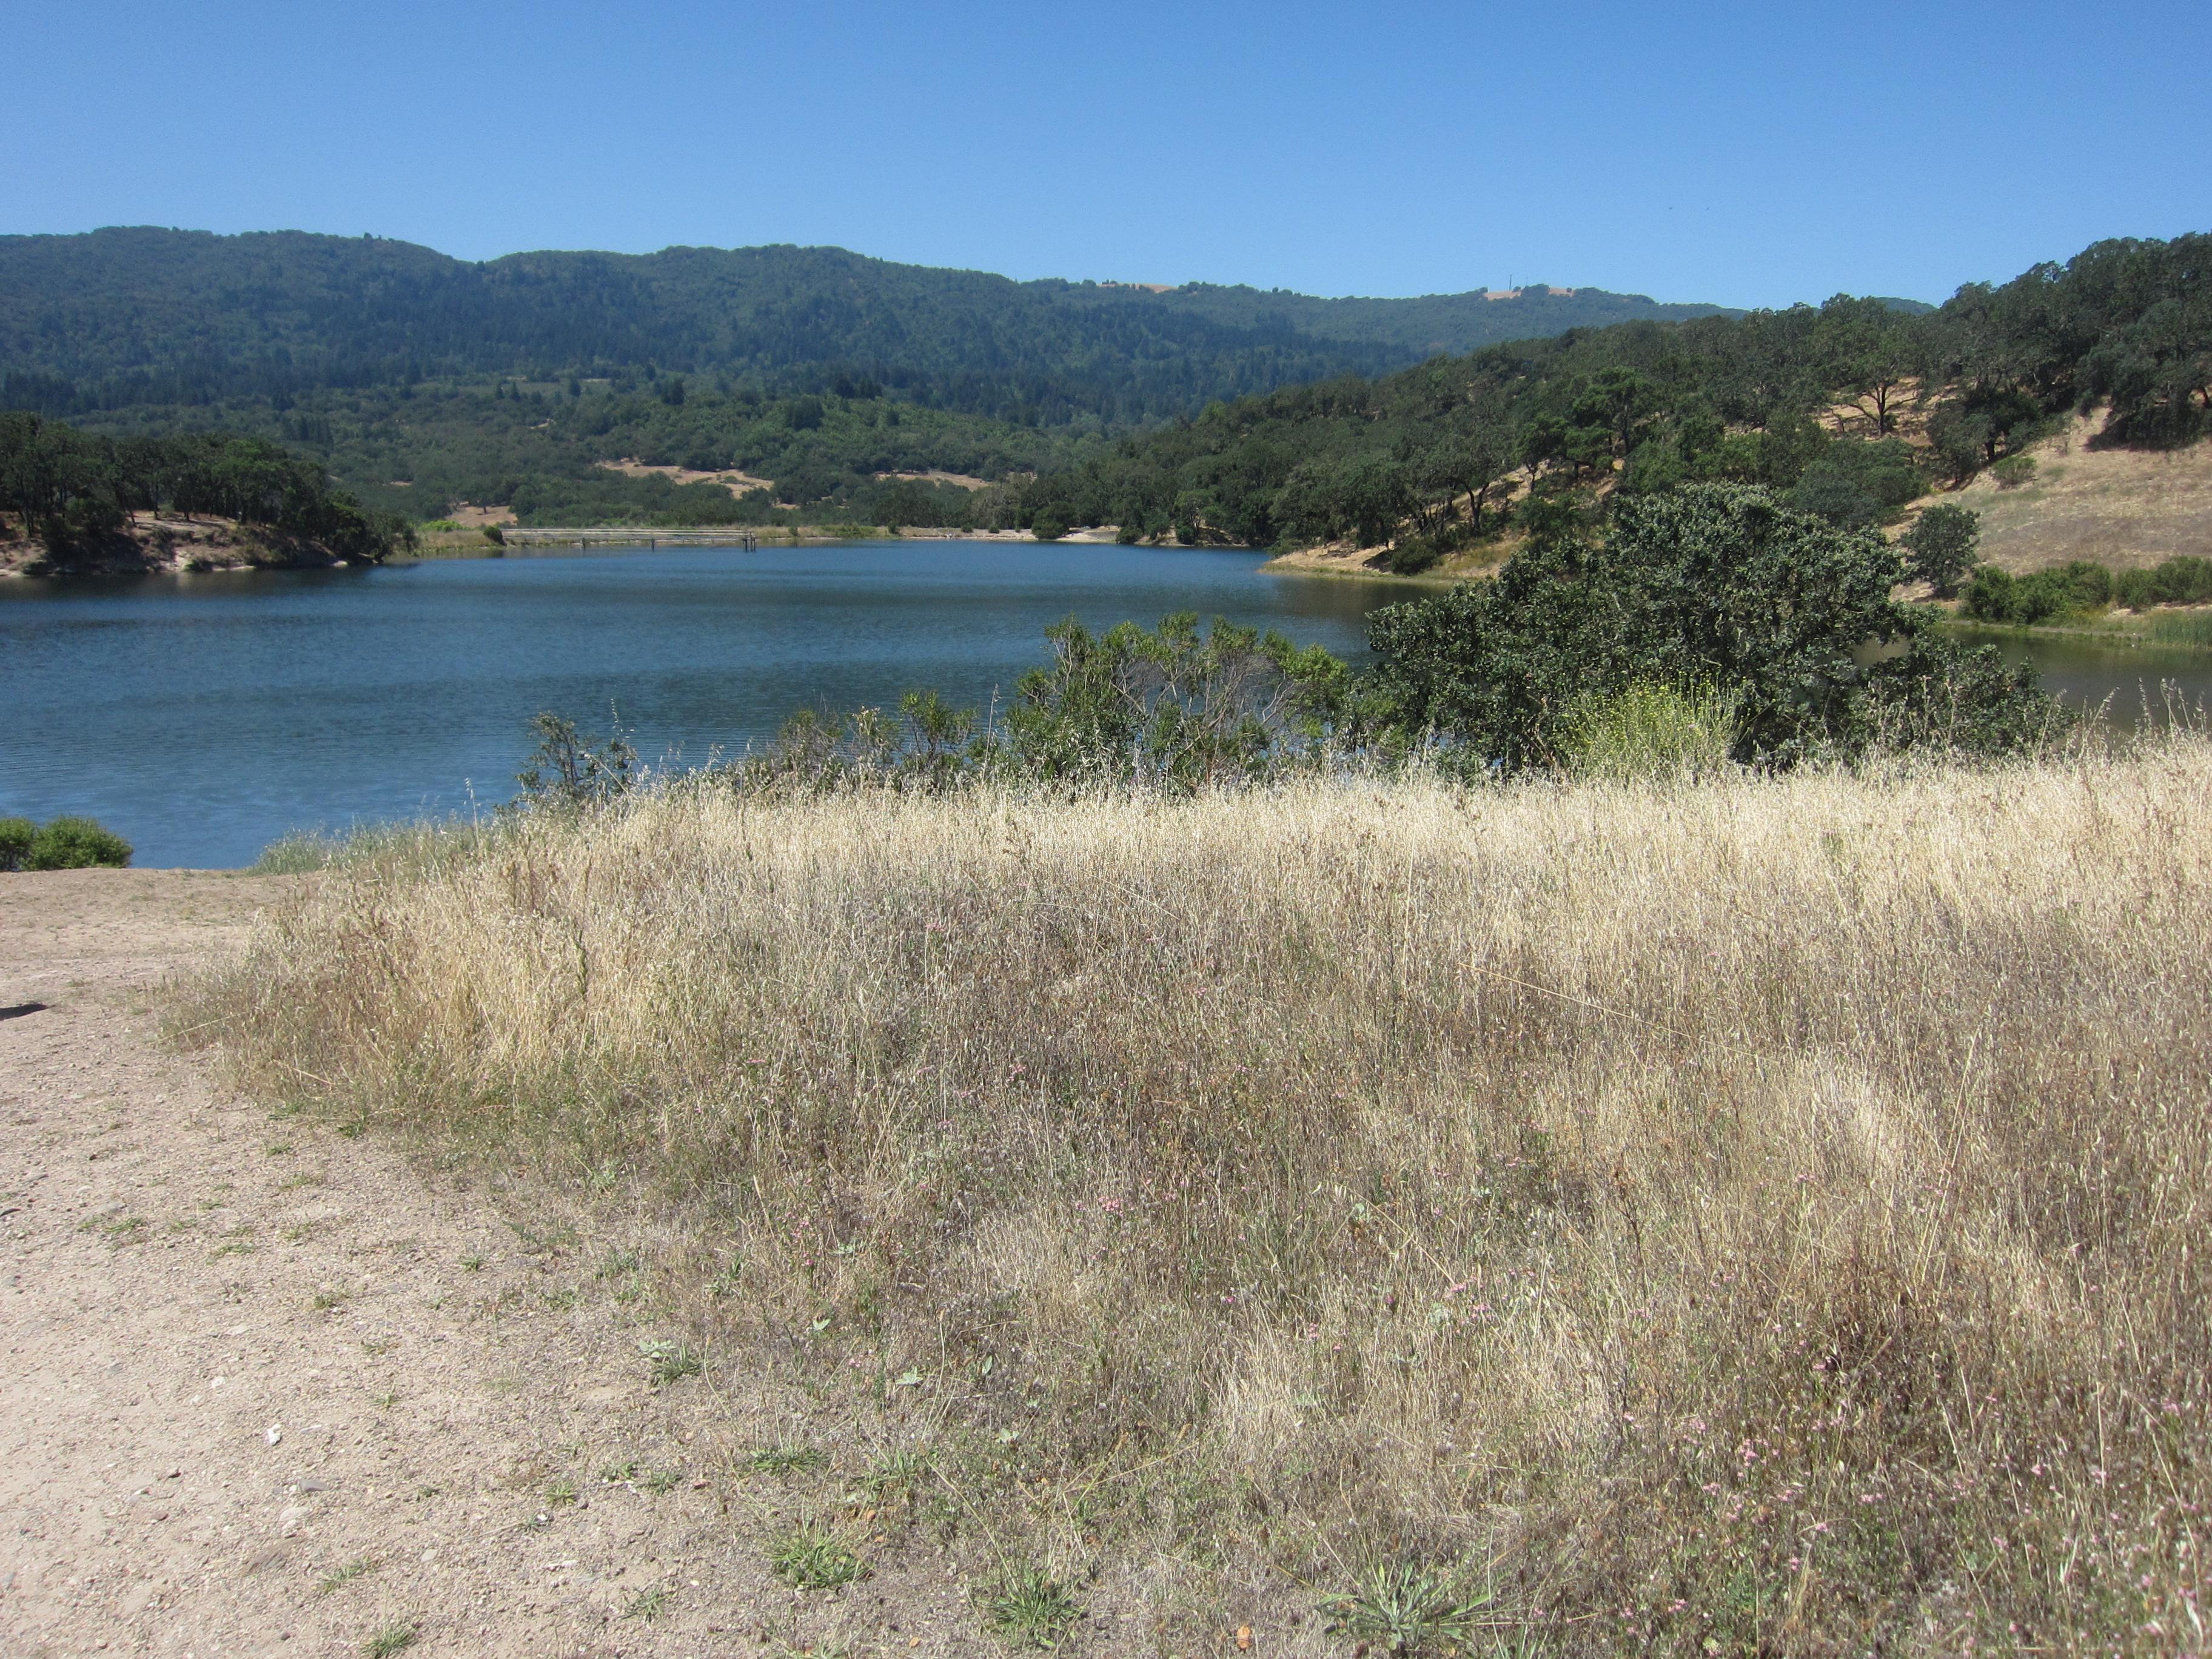 Glen valley regional park